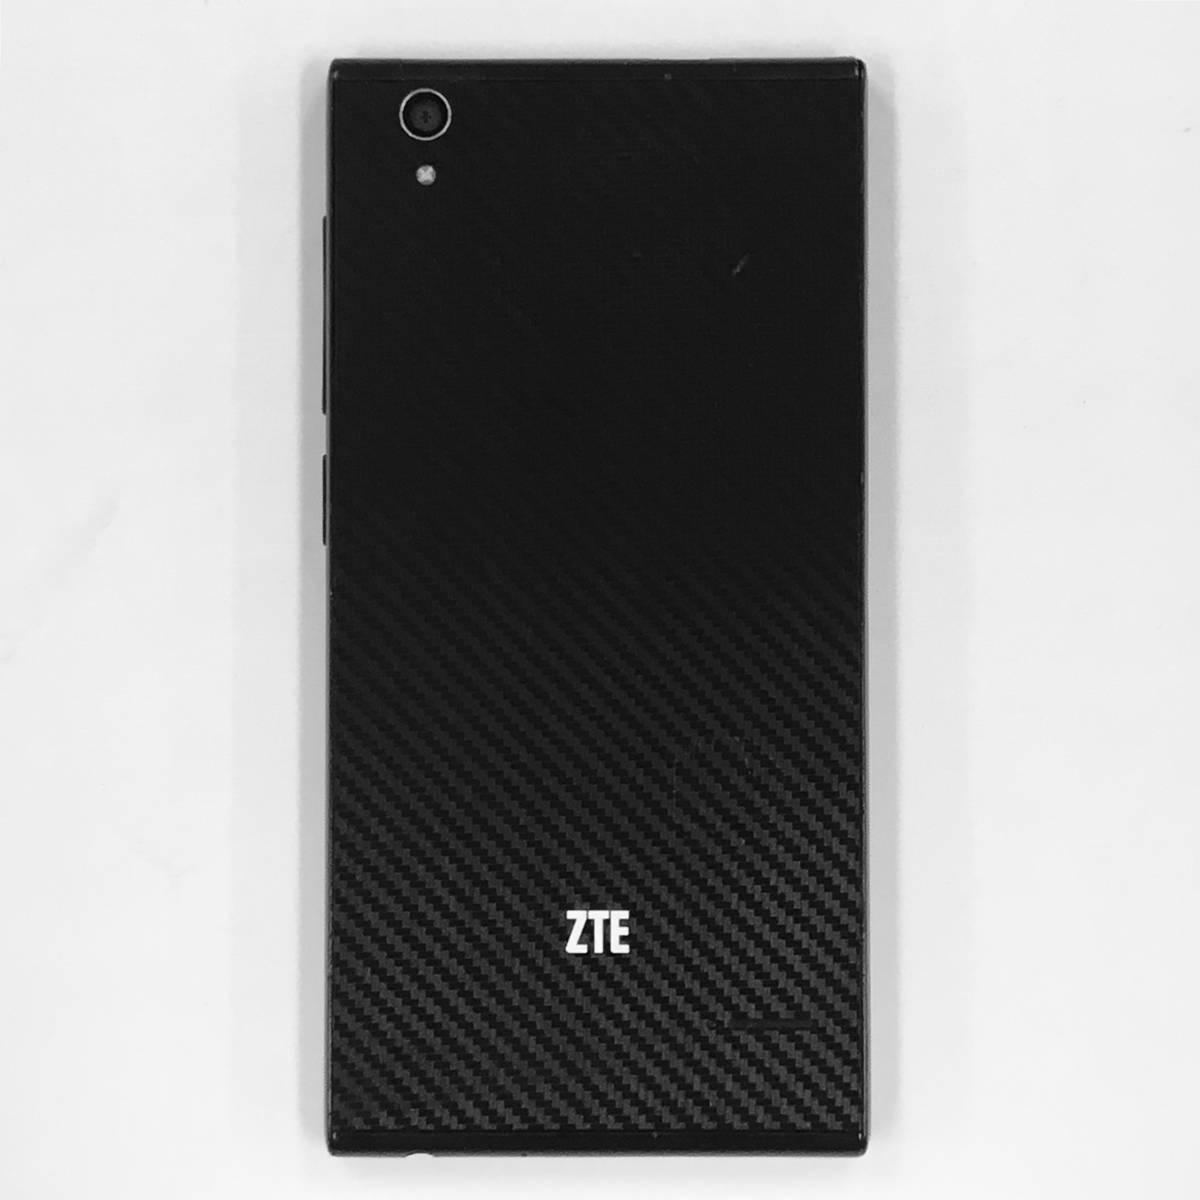 FP050543_(312)【送料無料】ZTE/Blade Vec 4G/ブラック/16GB/Wi-Fi+SIMモデル/SIMフリー/android/スマートフォン/スマホ【中古】_画像5